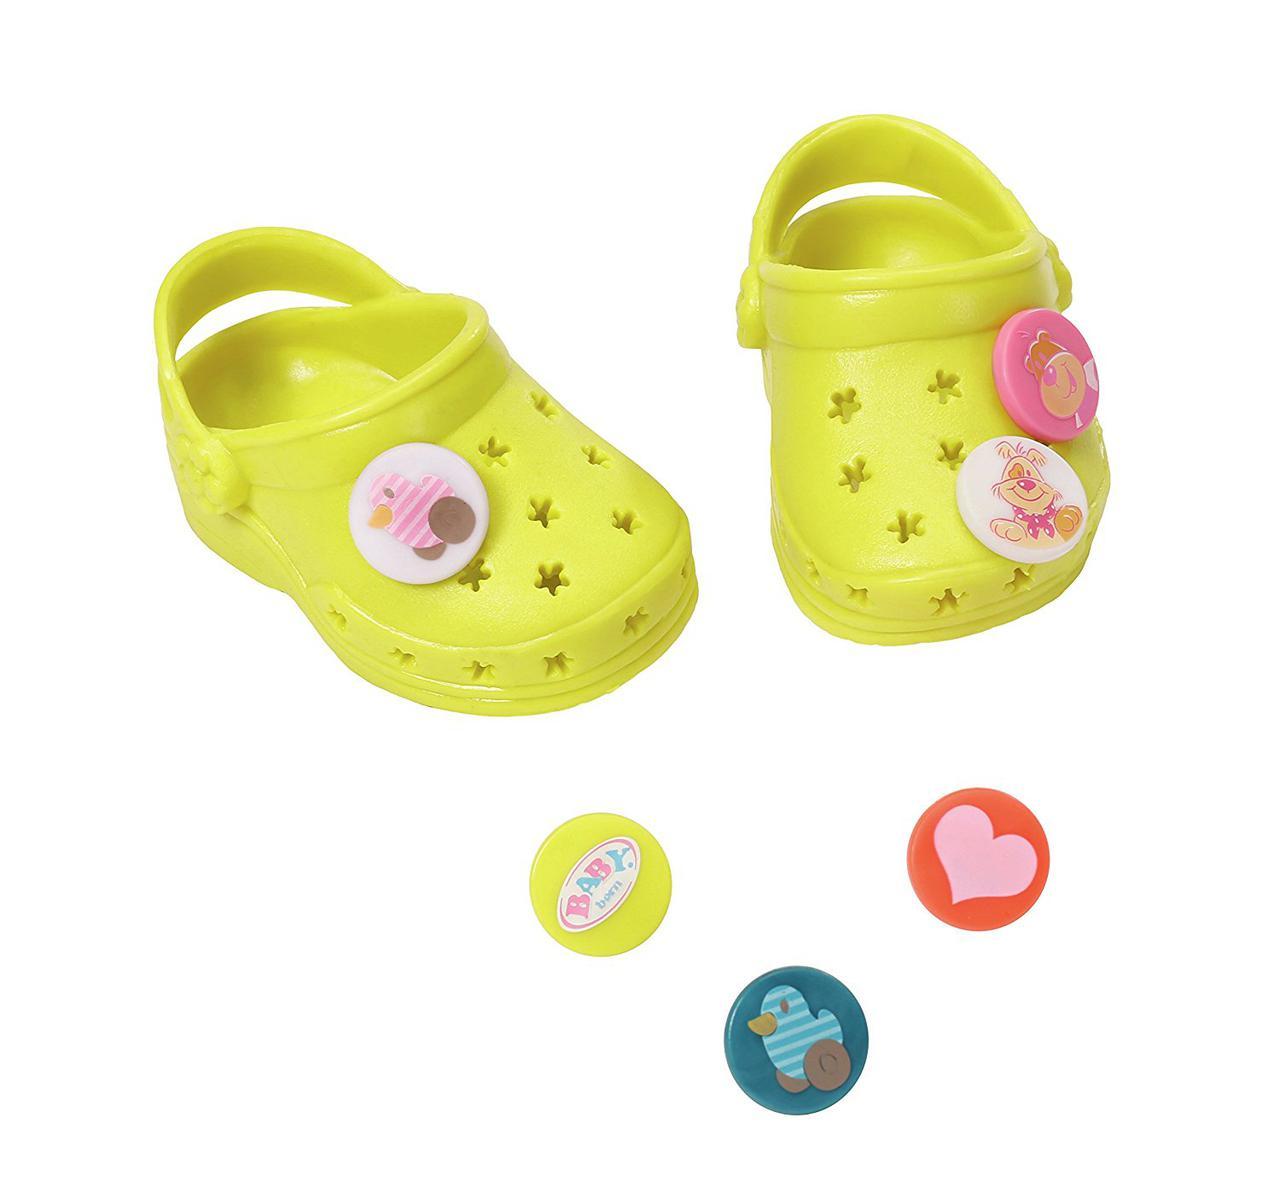 Кроксы куклы Беби Борн желтые Baby Born Zapf Creation 822067